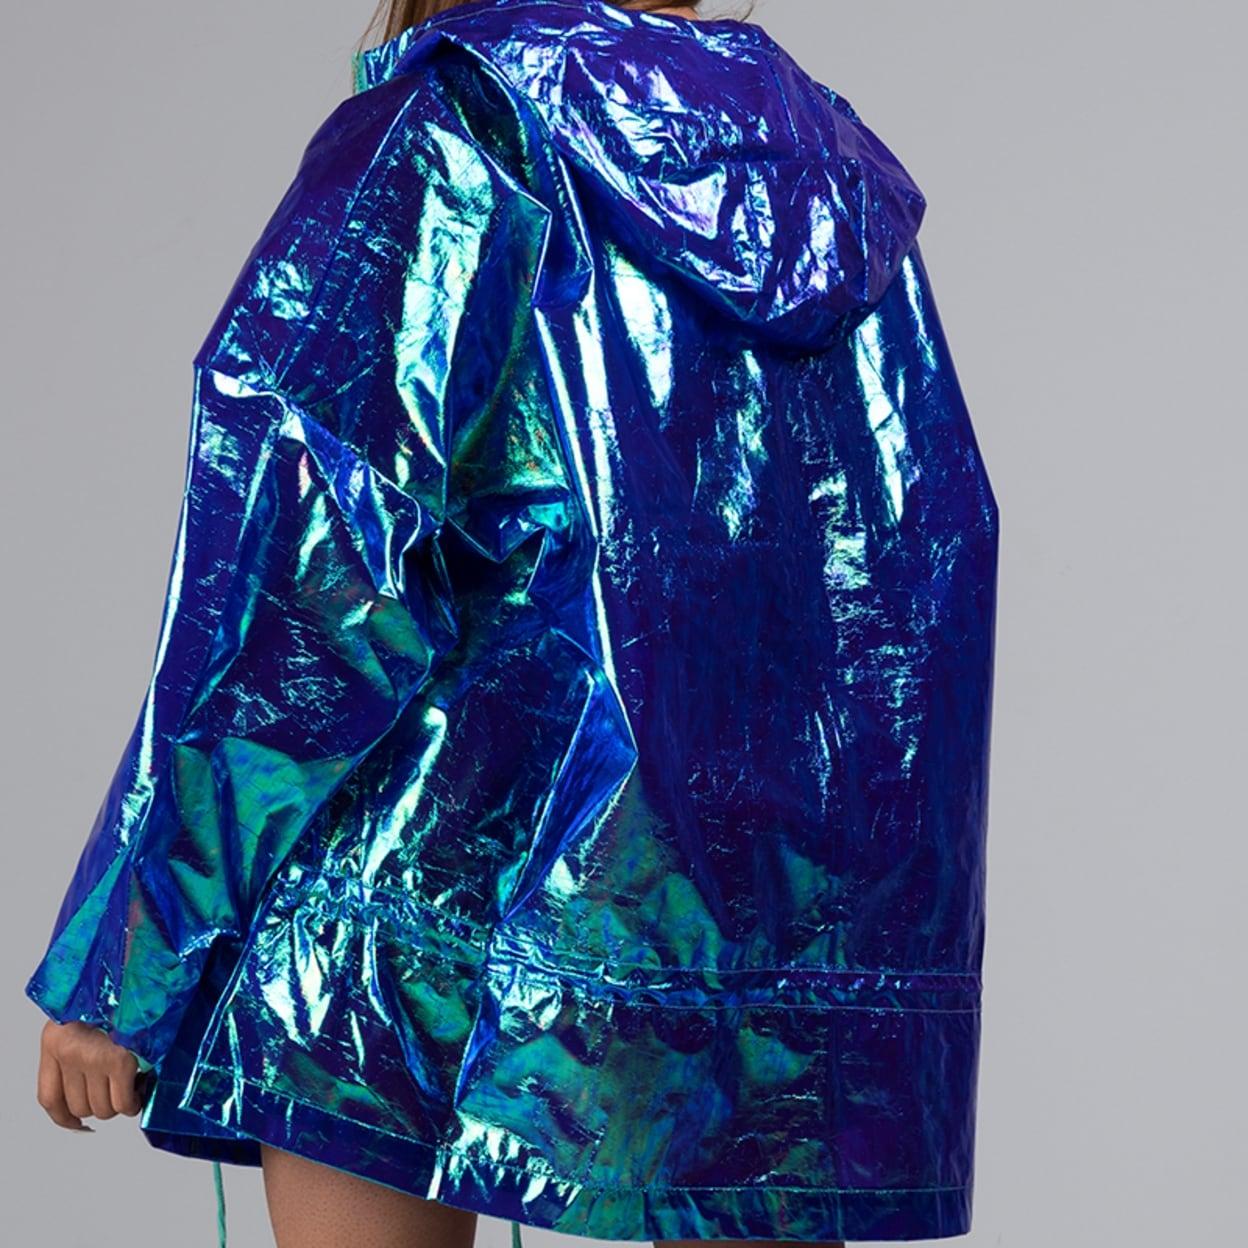 2b735f503efc Shop AKIRA Women s Iridescent Shiny Hologram Hooded Zip Front Party Rain  Jacket Coat - Free Shipping Today - Overstock - 25779064